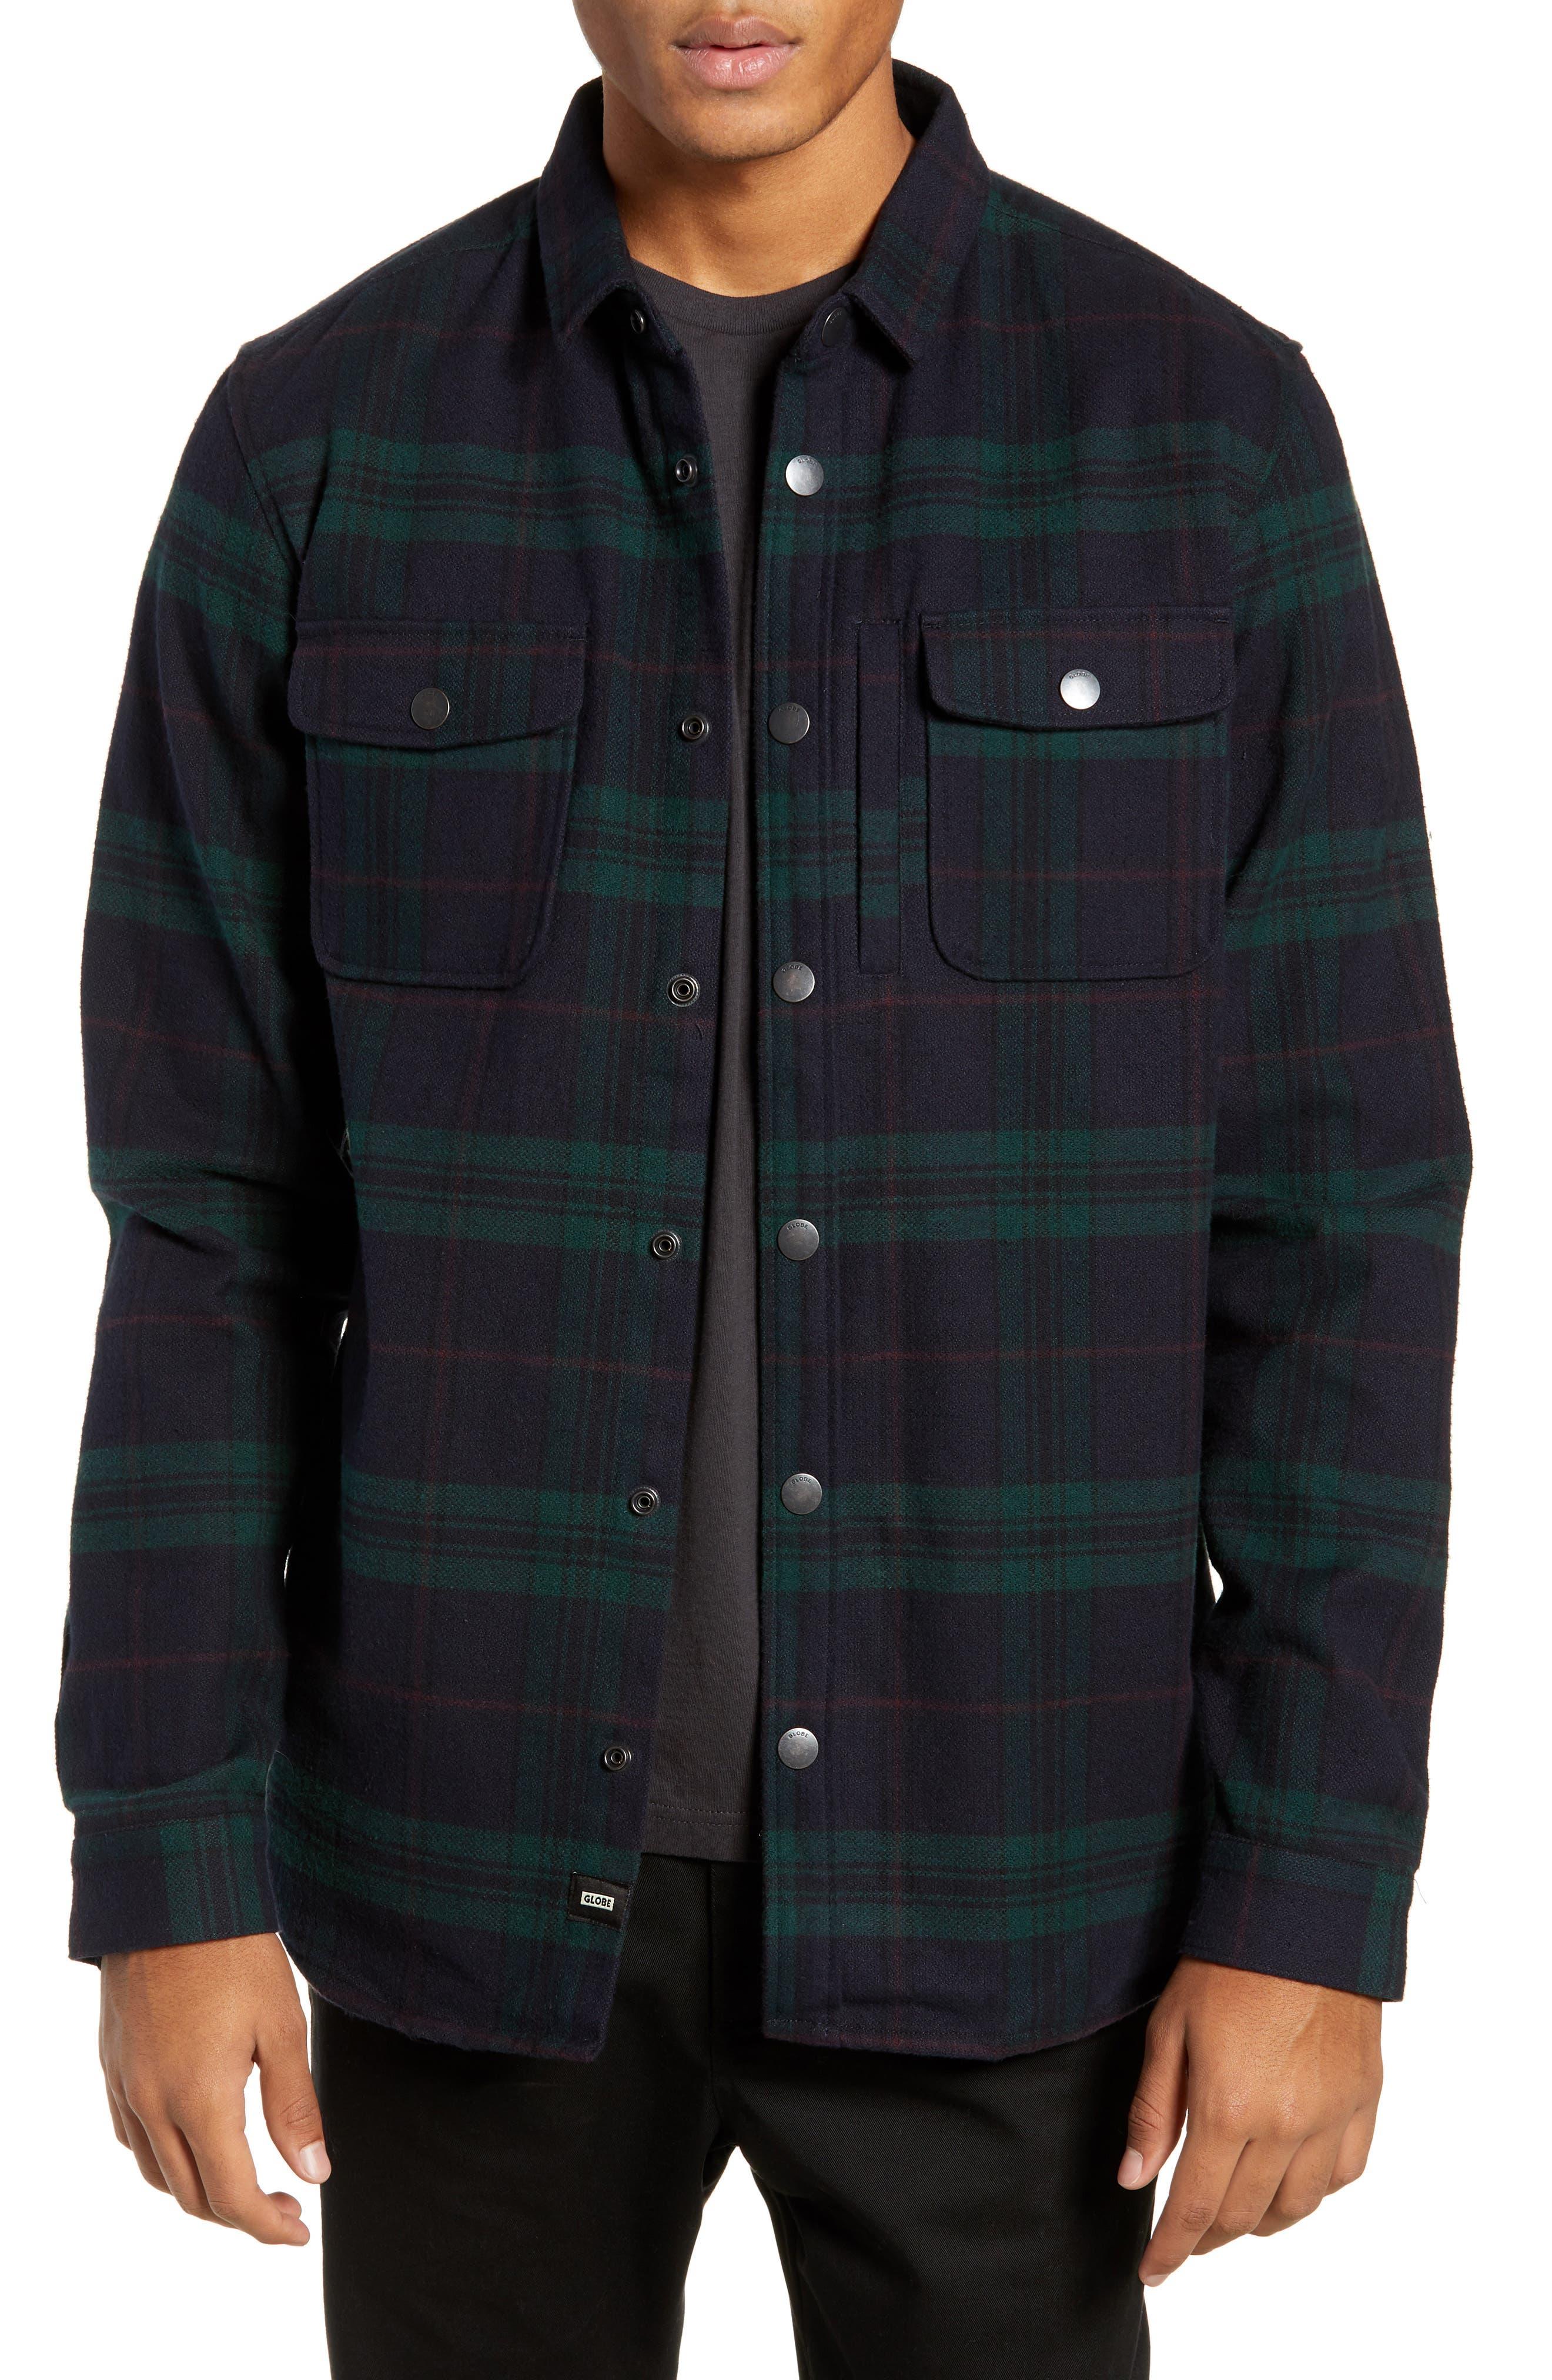 GLOBE Clifton Long Sleeve Flannel Shirt in Bottle Green